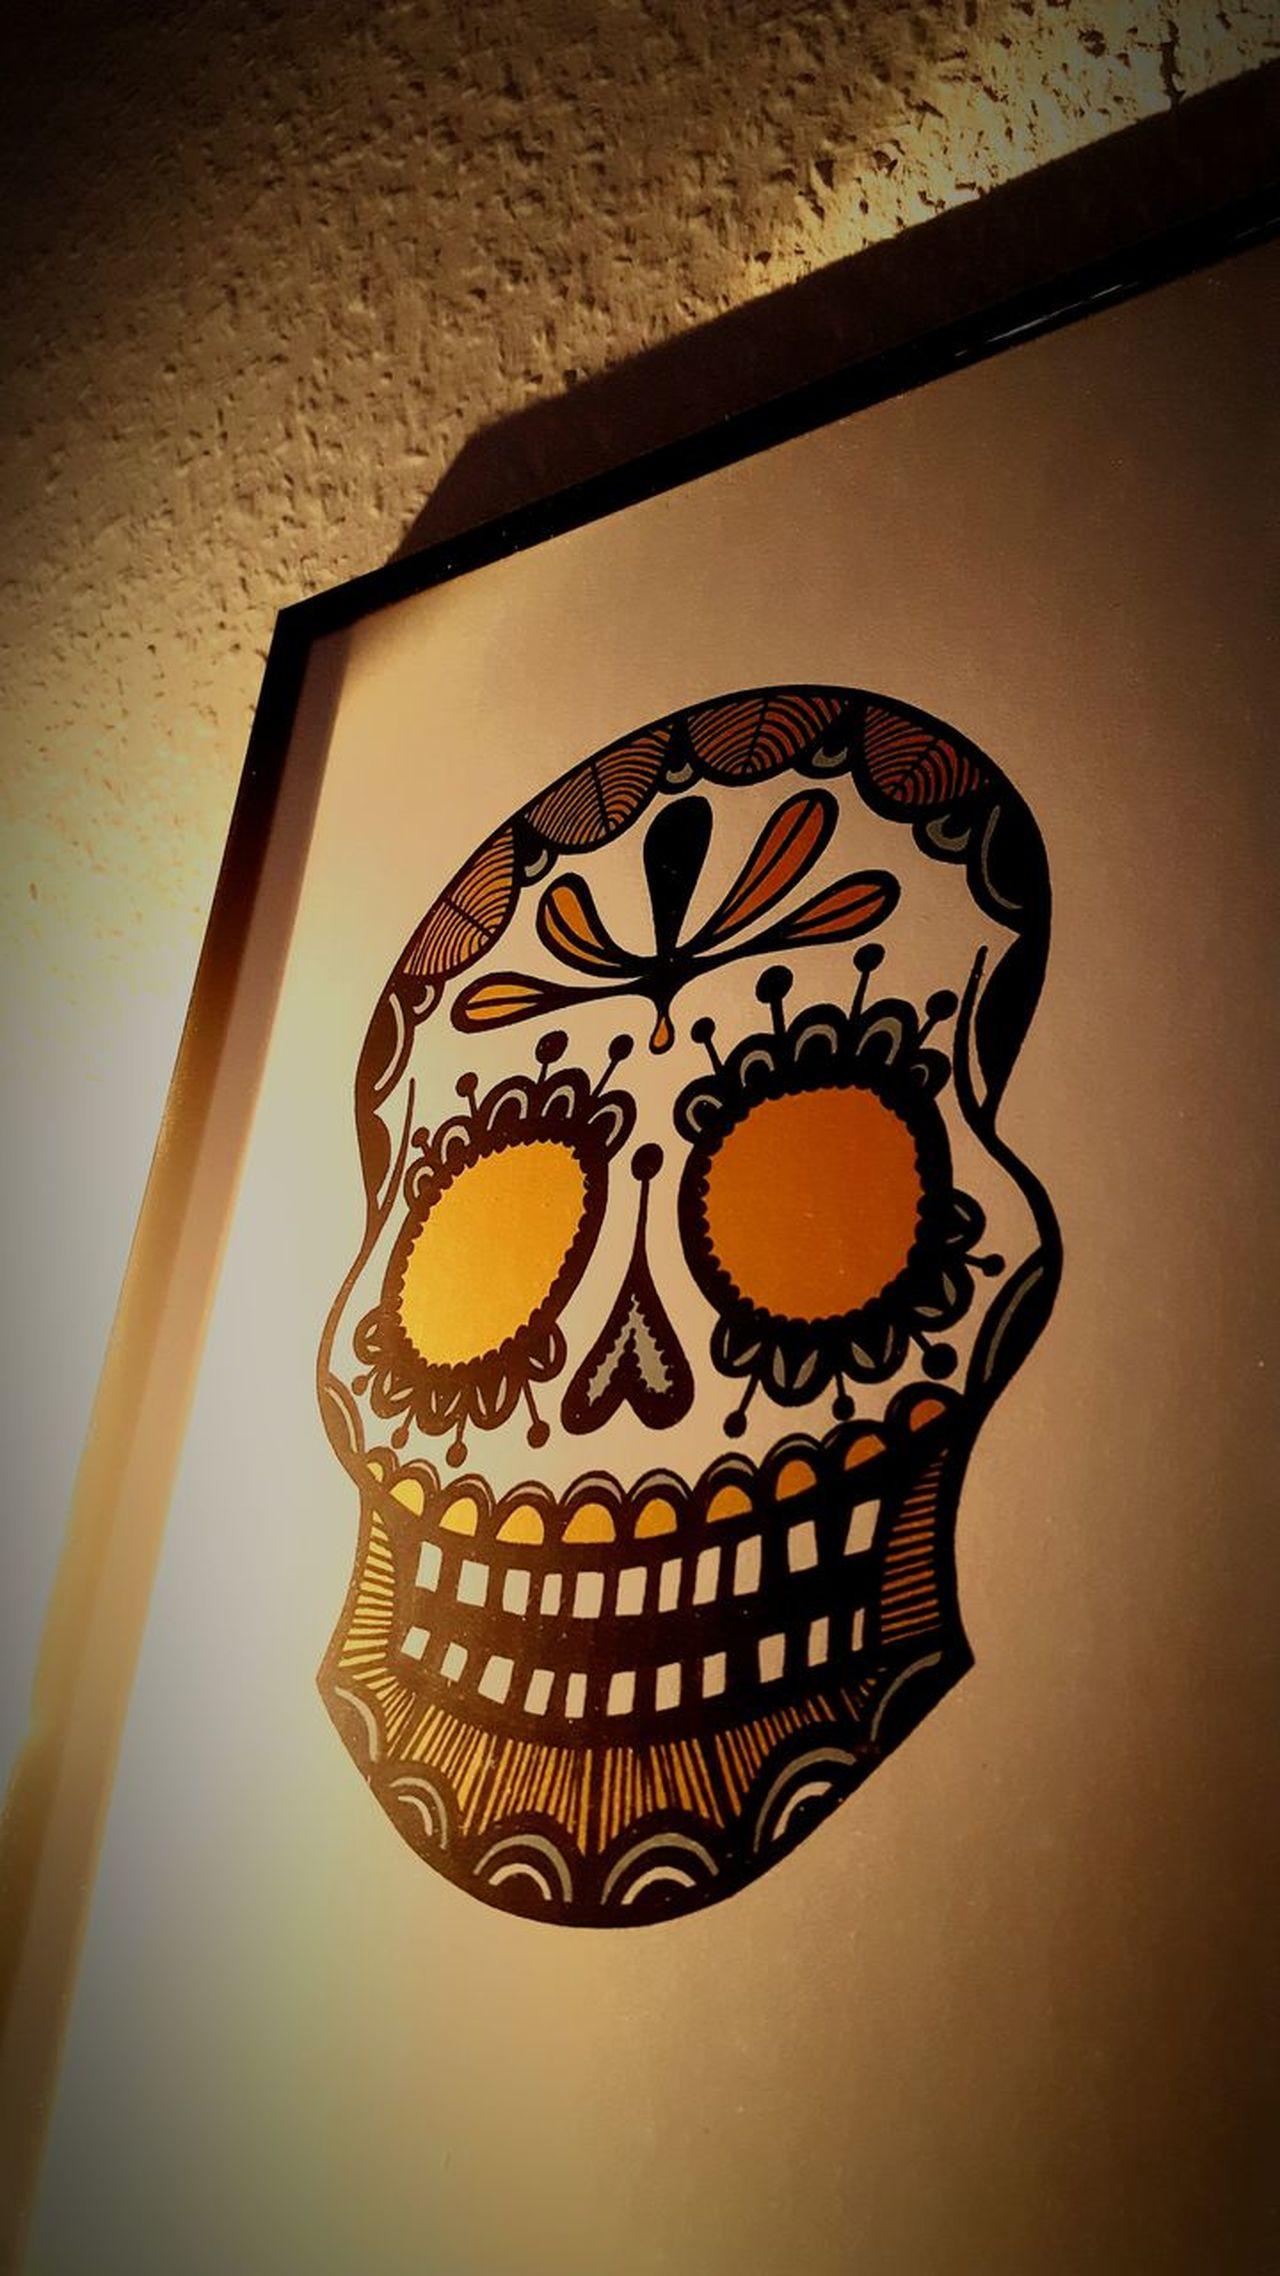 Mexican Skull Mexican Skull Yellow Blue Black Raufaser Raufasertapete Vs Glatt Totenkopf Mexikanisch Frida Kahlo Fridakahlo